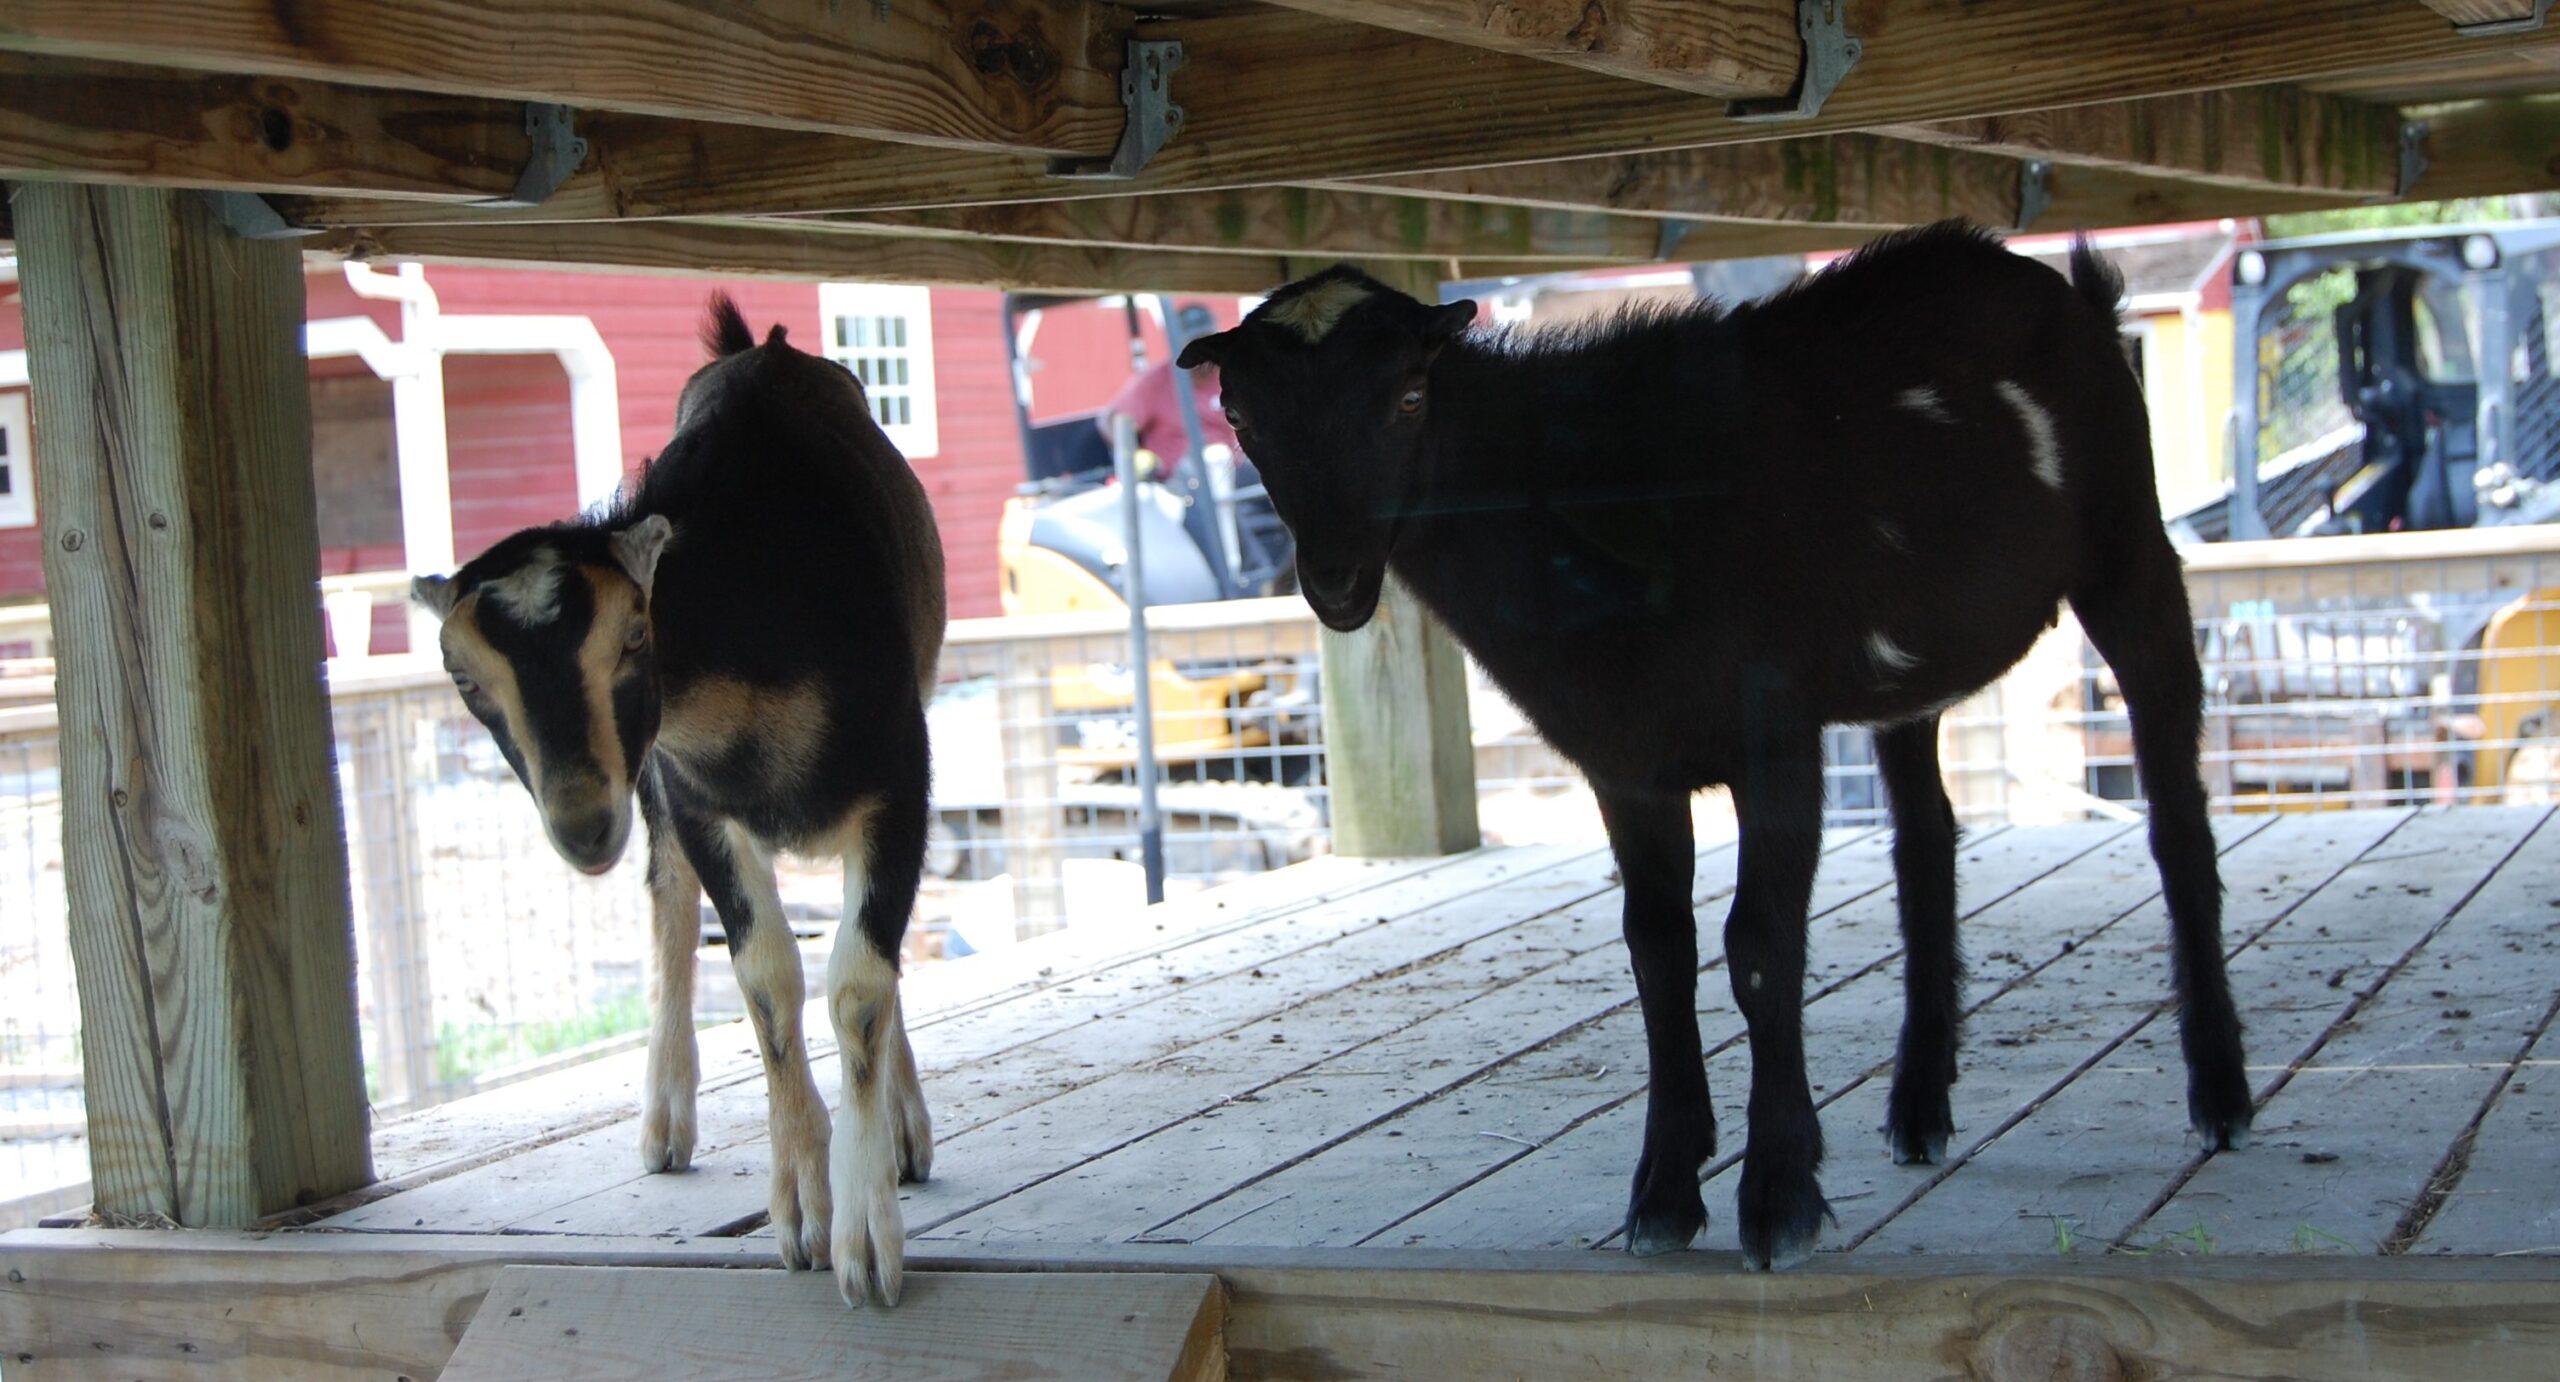 Lilly (L) and Sunny (R), the mini LaMancha goats.